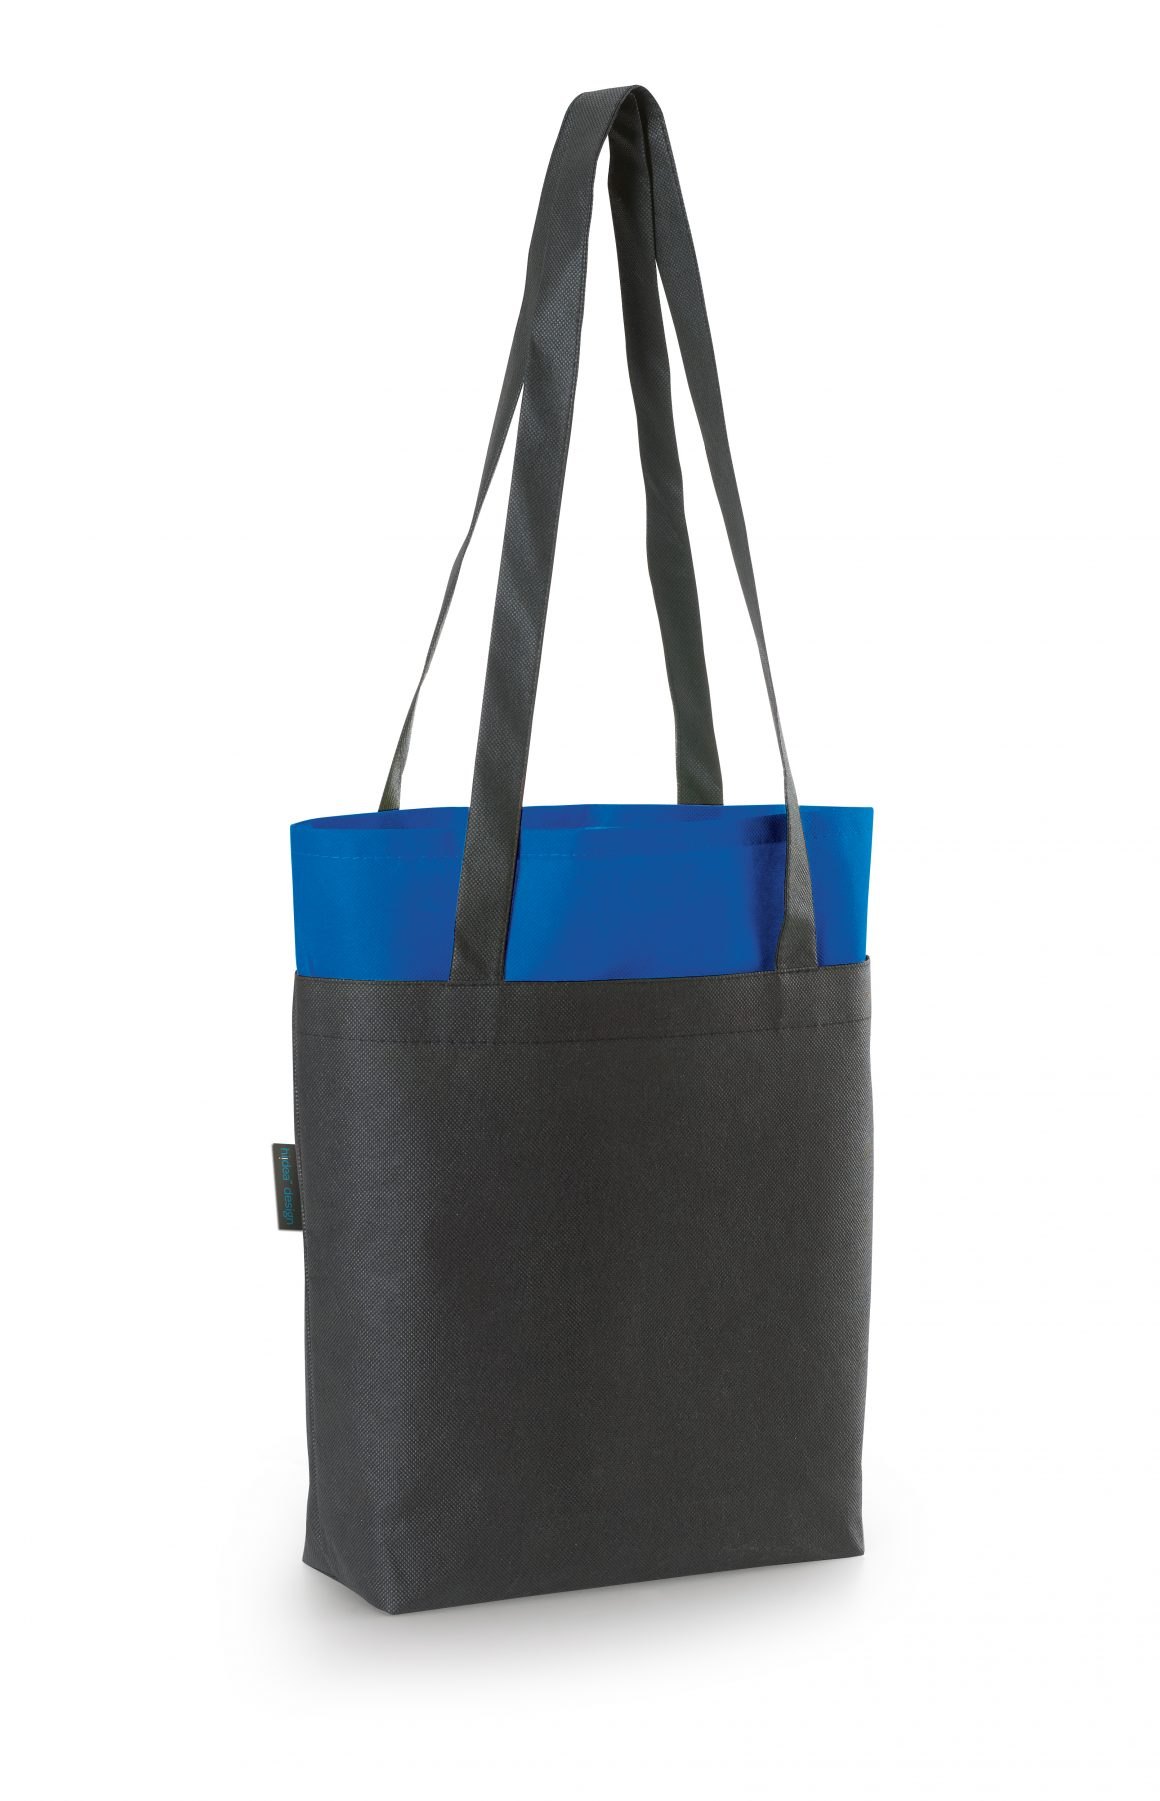 Nance Bag Product Code GP92881